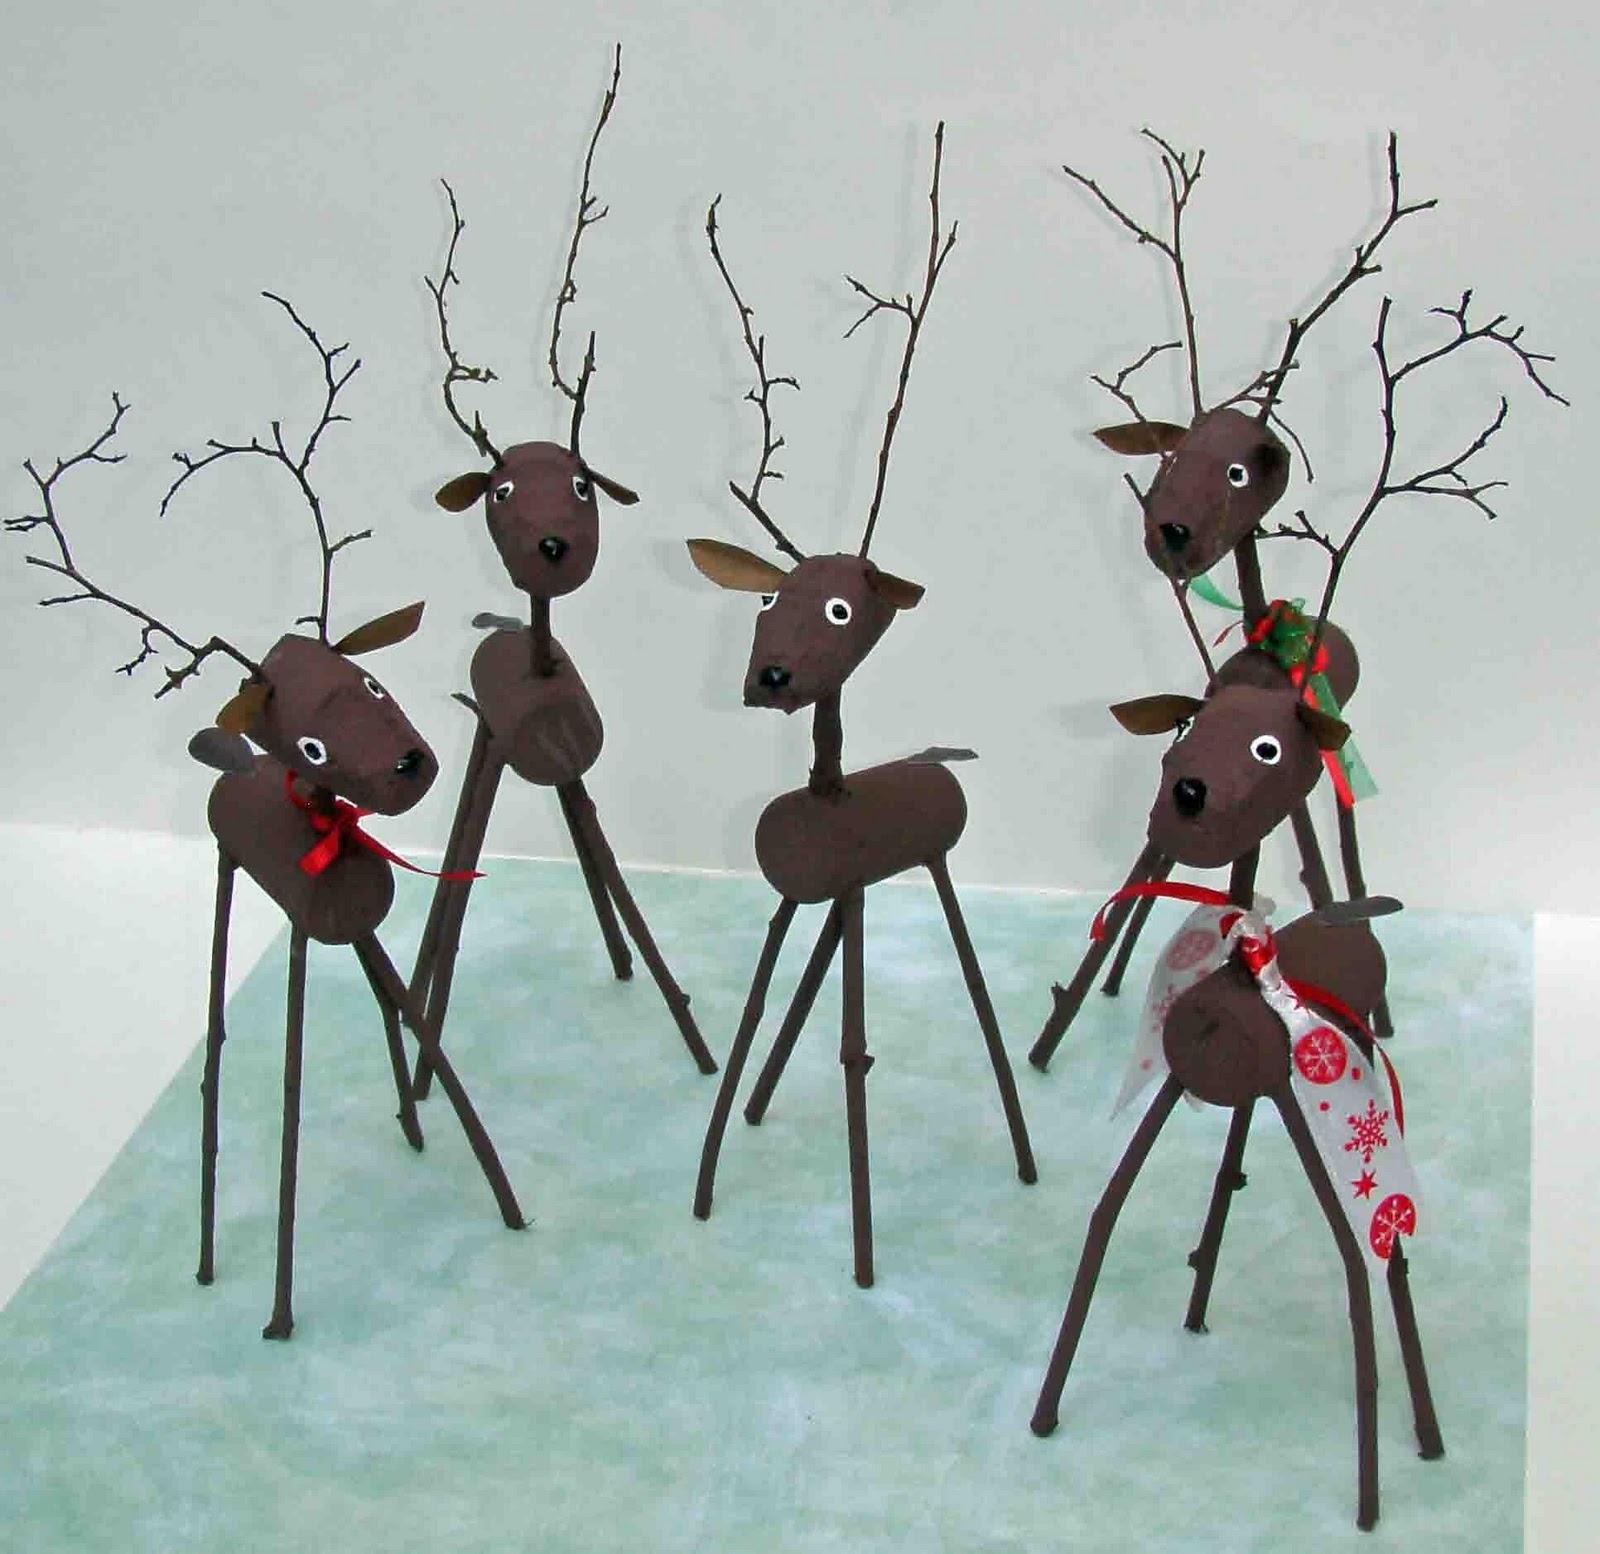 Crack of dawn crafts reindeer cork craft for Cork craft